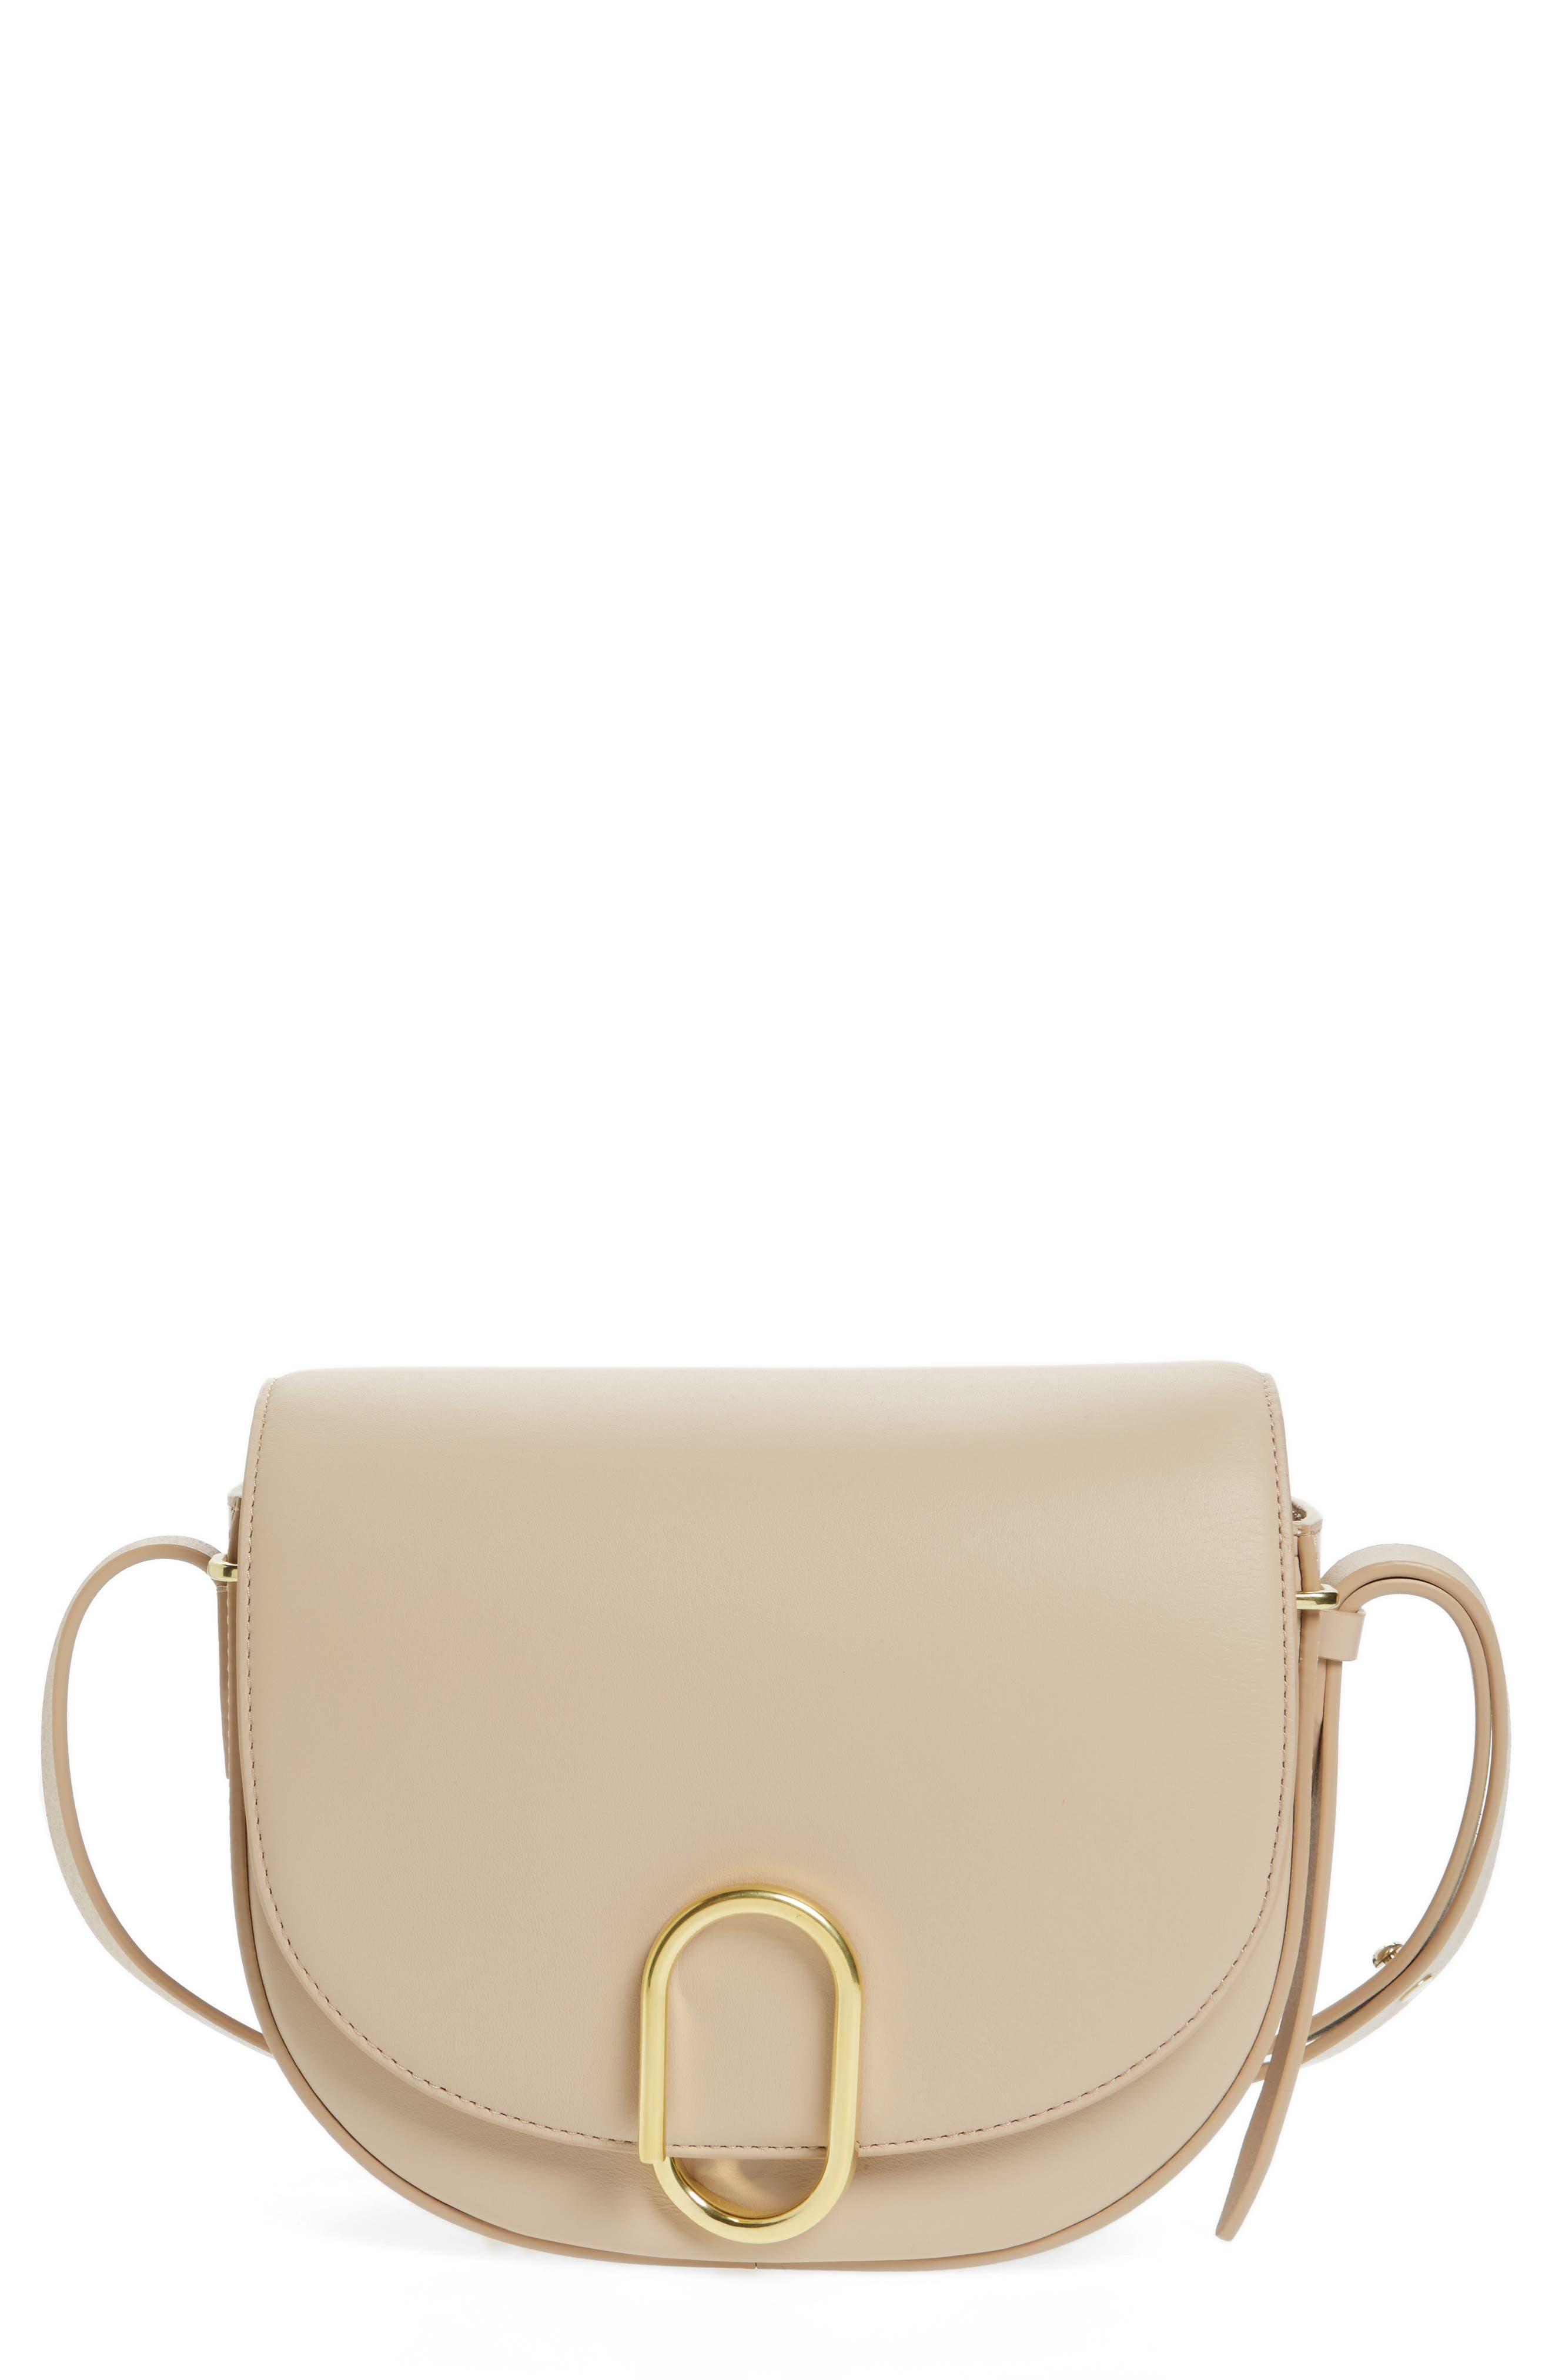 Alix Leather Saddle Bag,                         Main,                         color, Cashew/ Gold